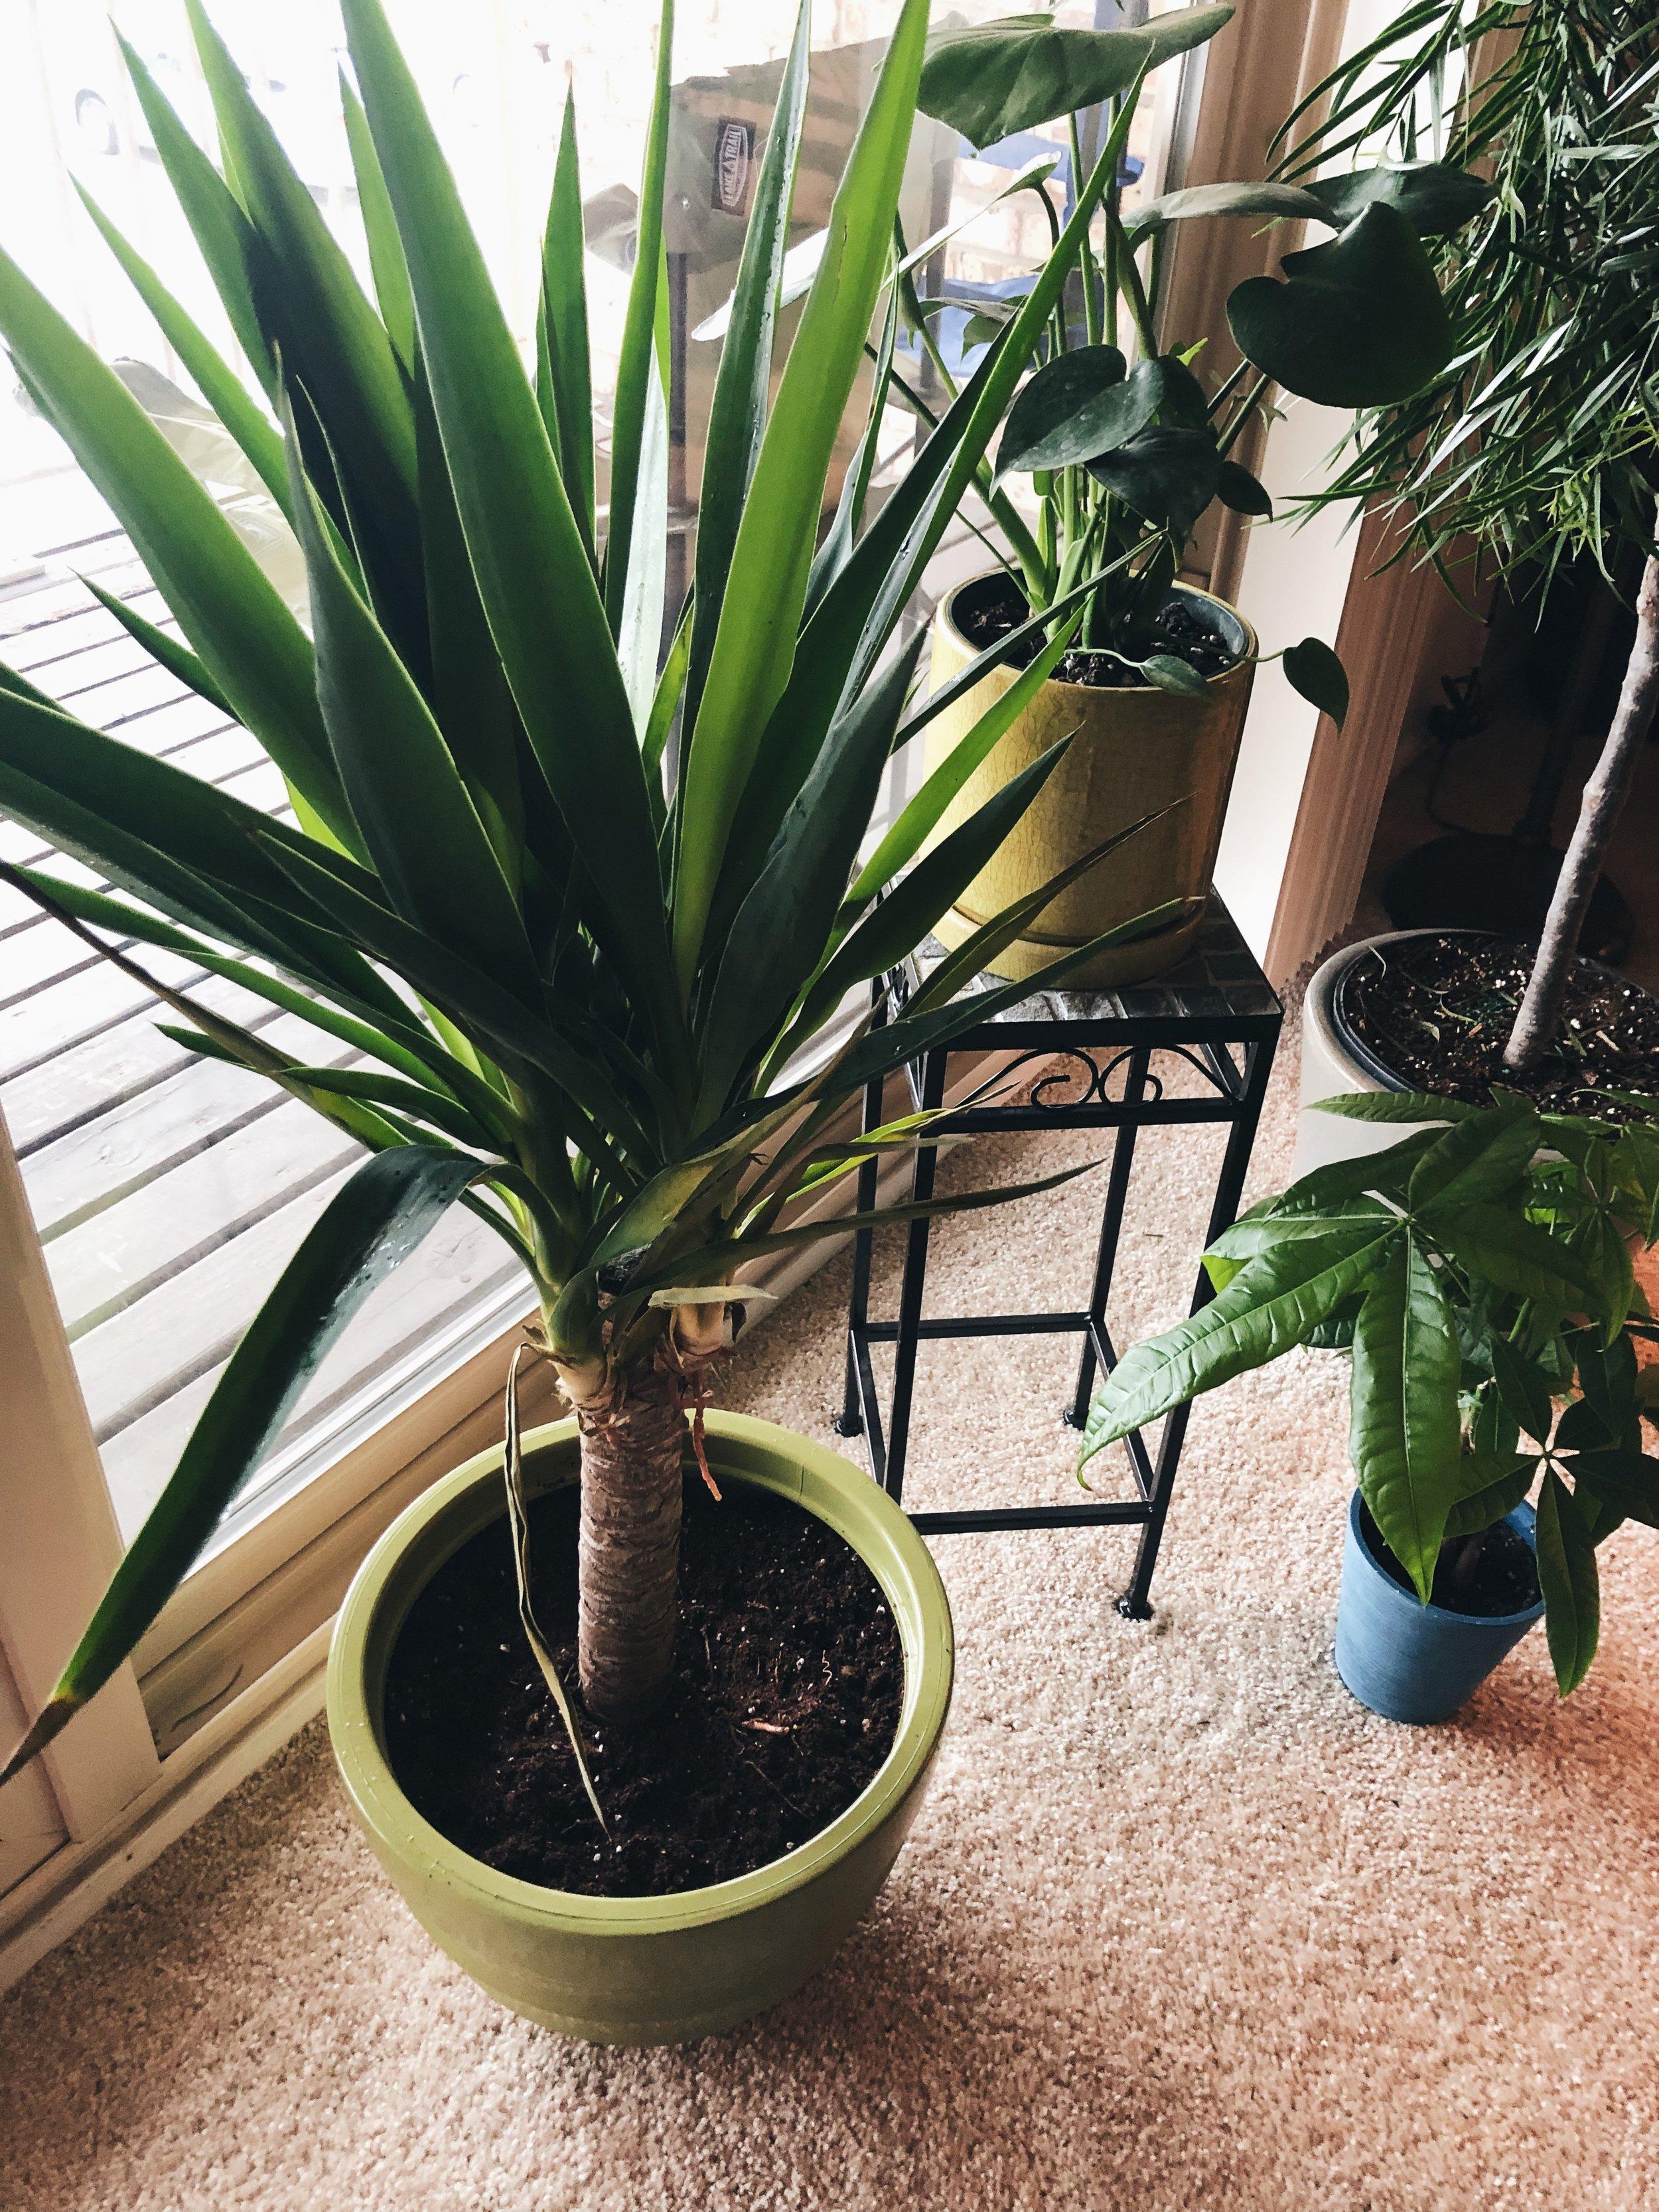 """Yucky"" the Yucca Plant - Yucca Elephantipes"